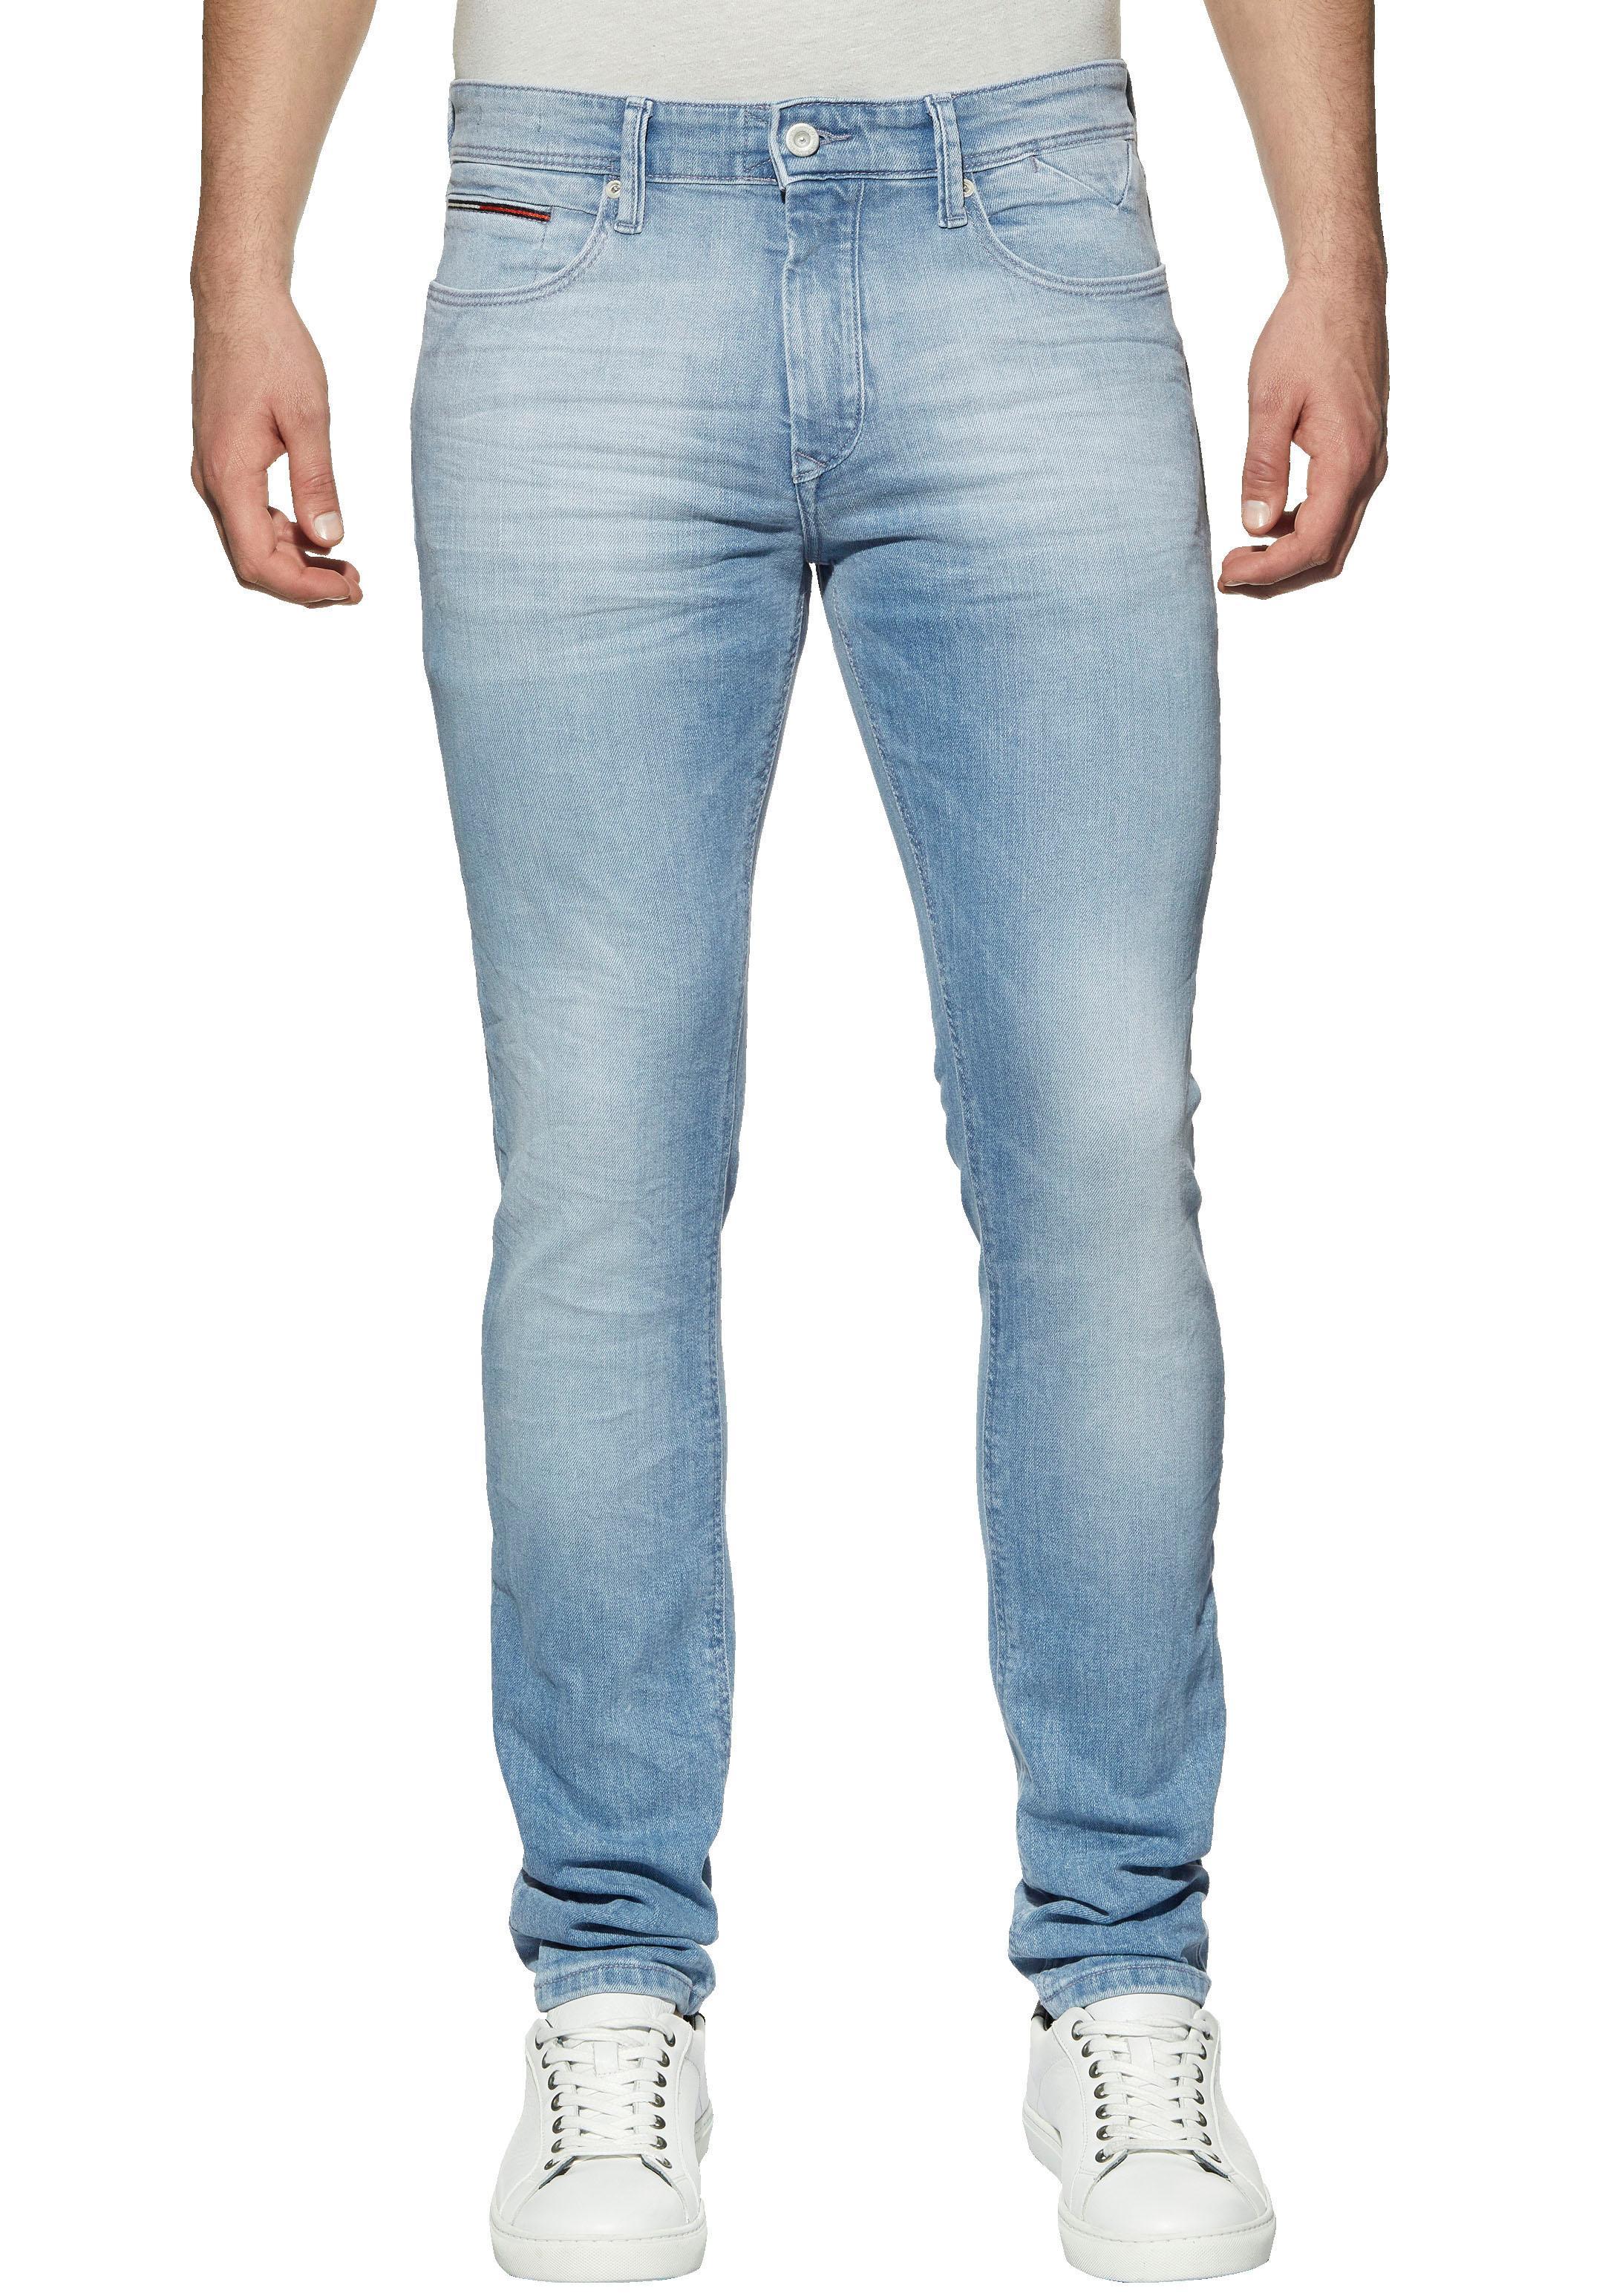 TOMMY JEANS Slim-fit-Jeans SLIM TAPERED STEVE | Bekleidung > Jeans > Slim Fit Jeans | Blau | Tommy Jeans